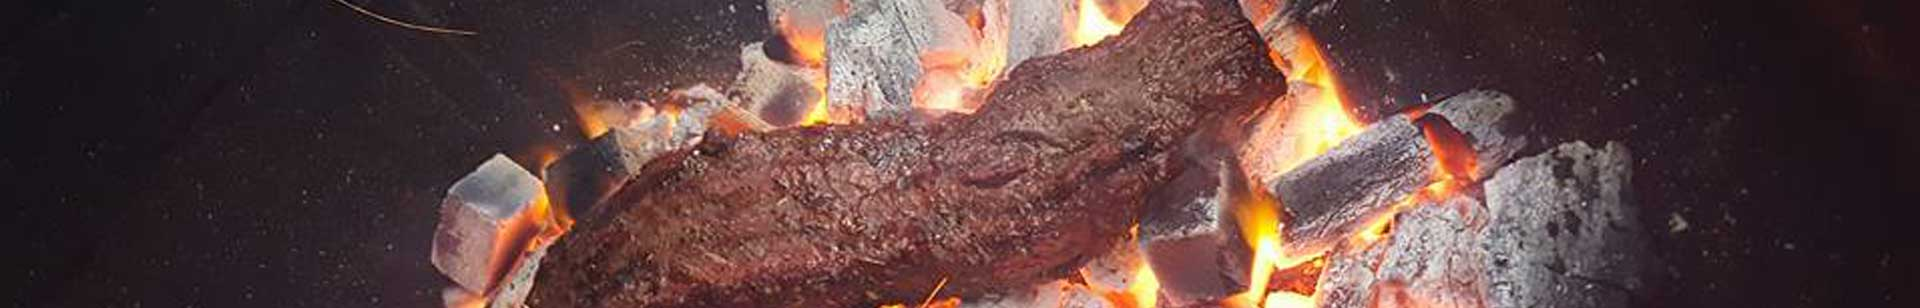 Online vlees bestellen, The Bastard, Ofyr, KamadoJoe, Officieel dealer van Ofyr & Big Green Egg en leverancier BBQ accessoires,